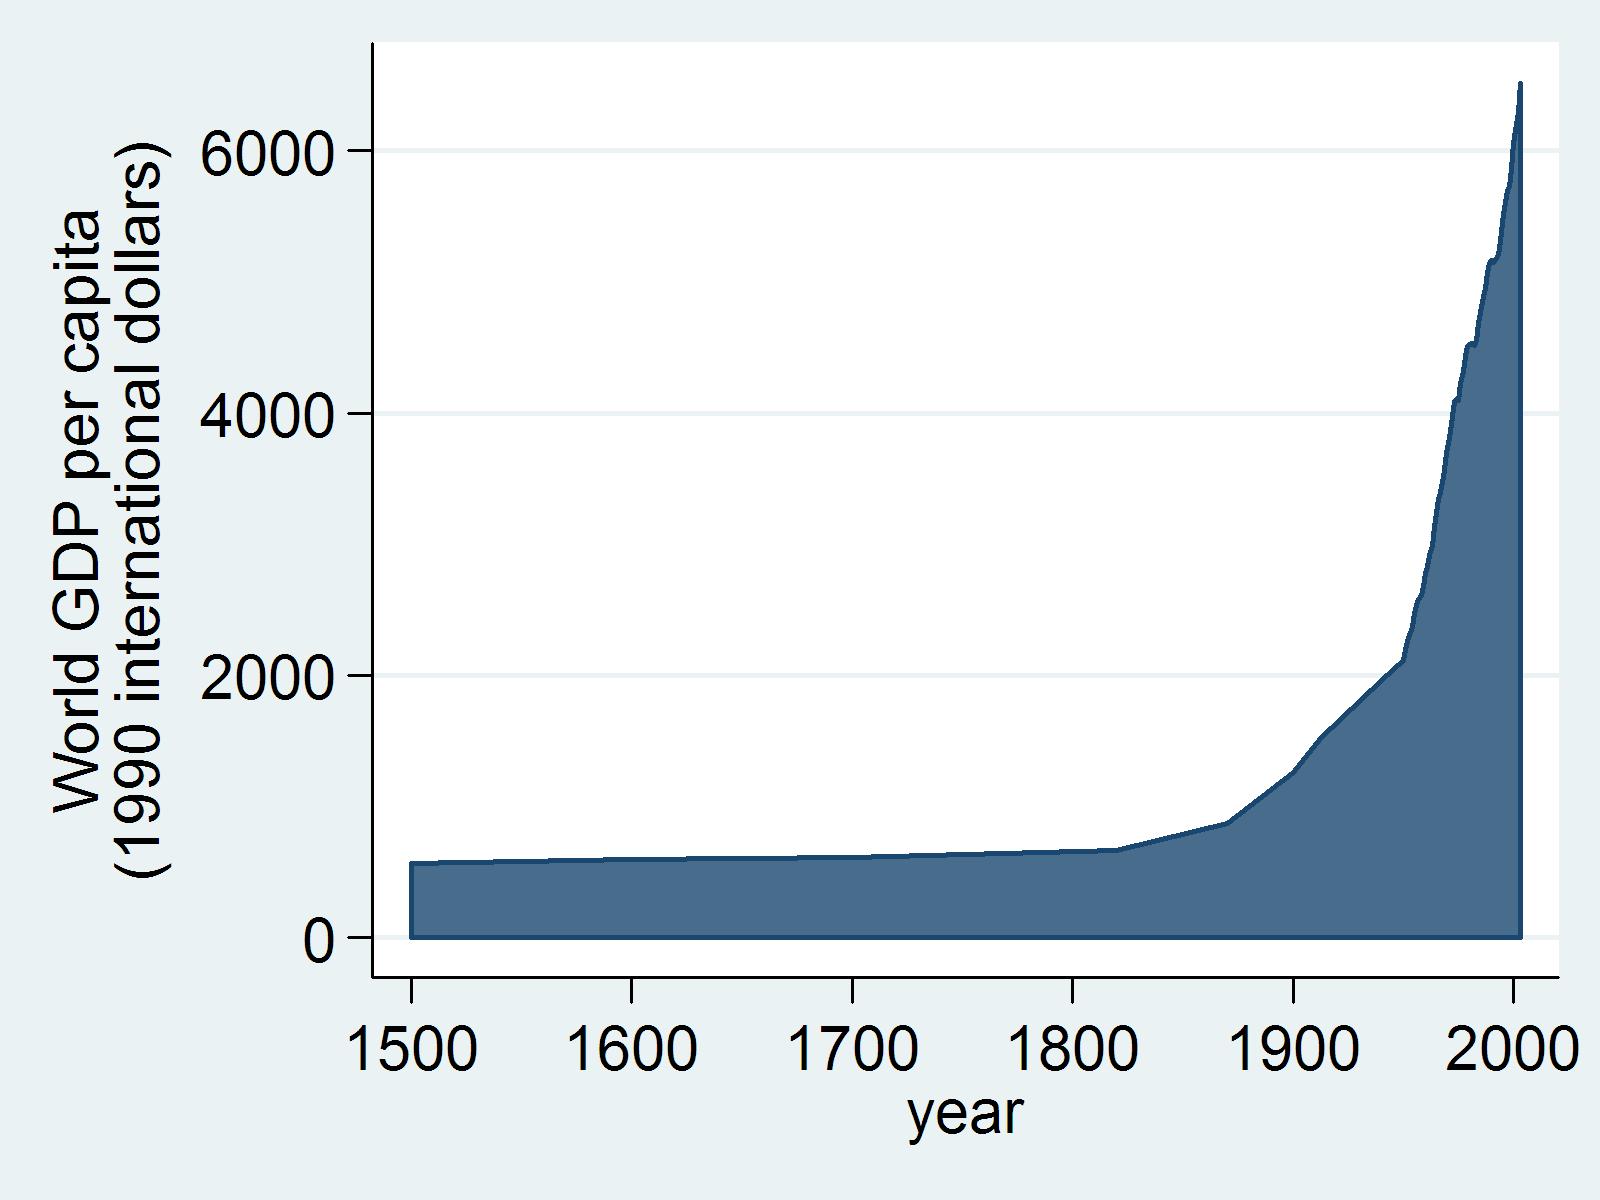 orldpercapitabetween15002003